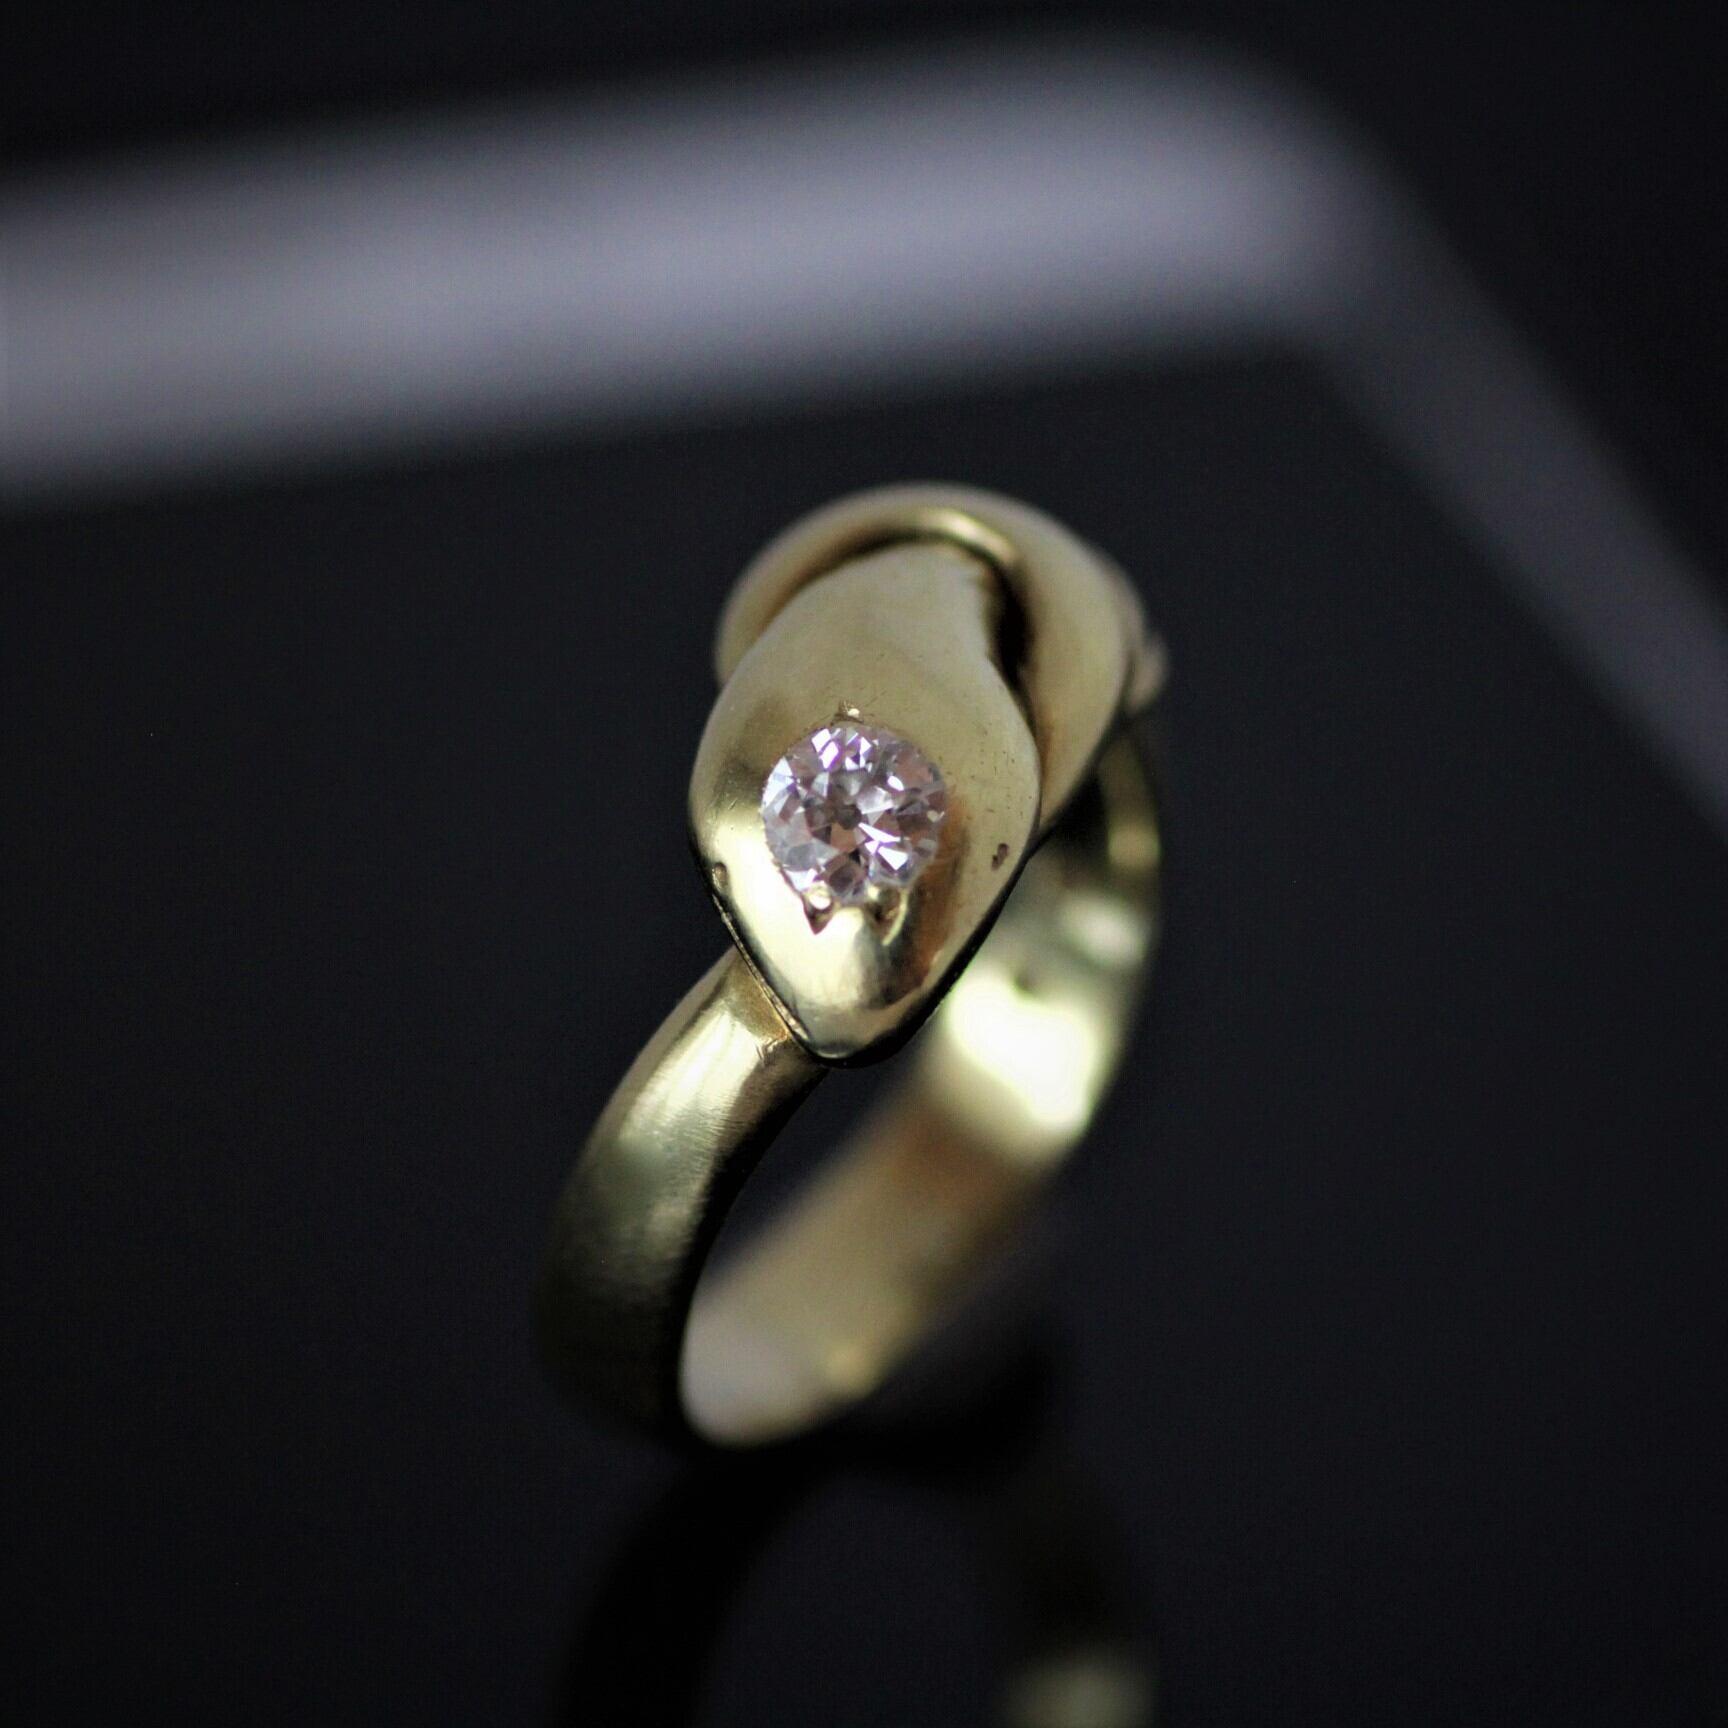 Gold & diamond Snake ring   ゴールド&ダイヤモンド スネークリング